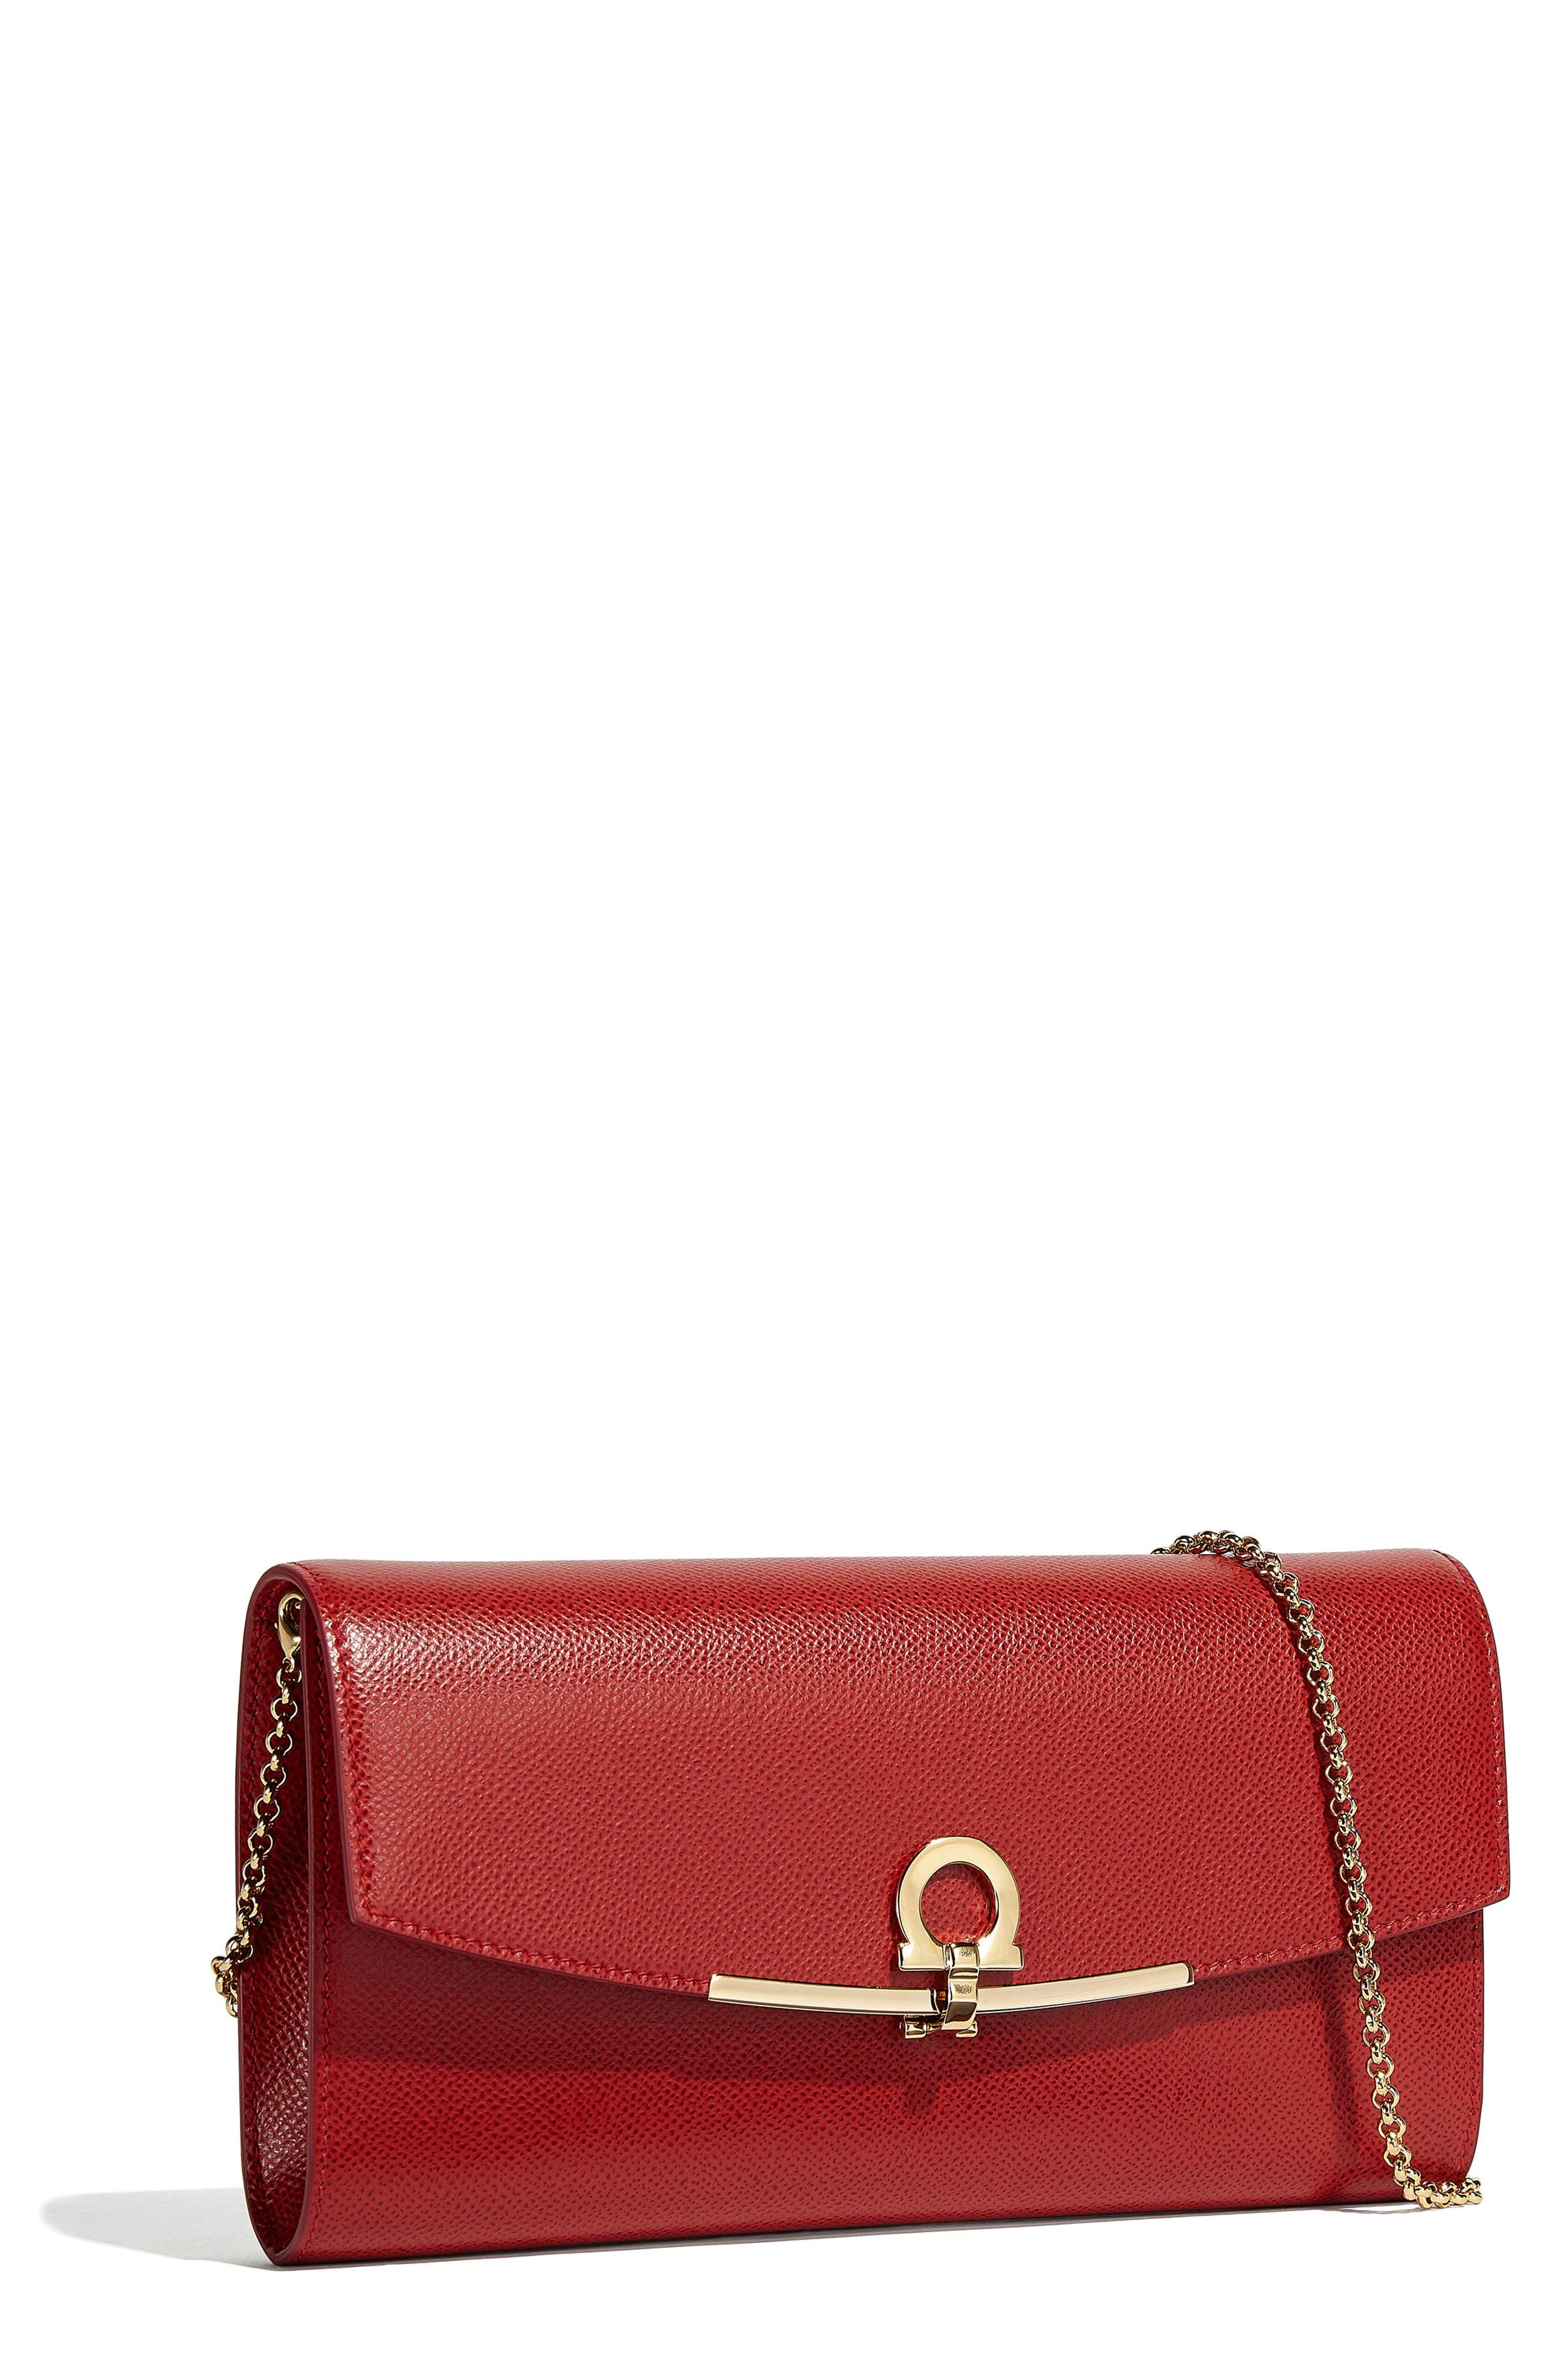 Gancio Calfskin Leather Clutch,                         Main,                         color, LIPSTICK